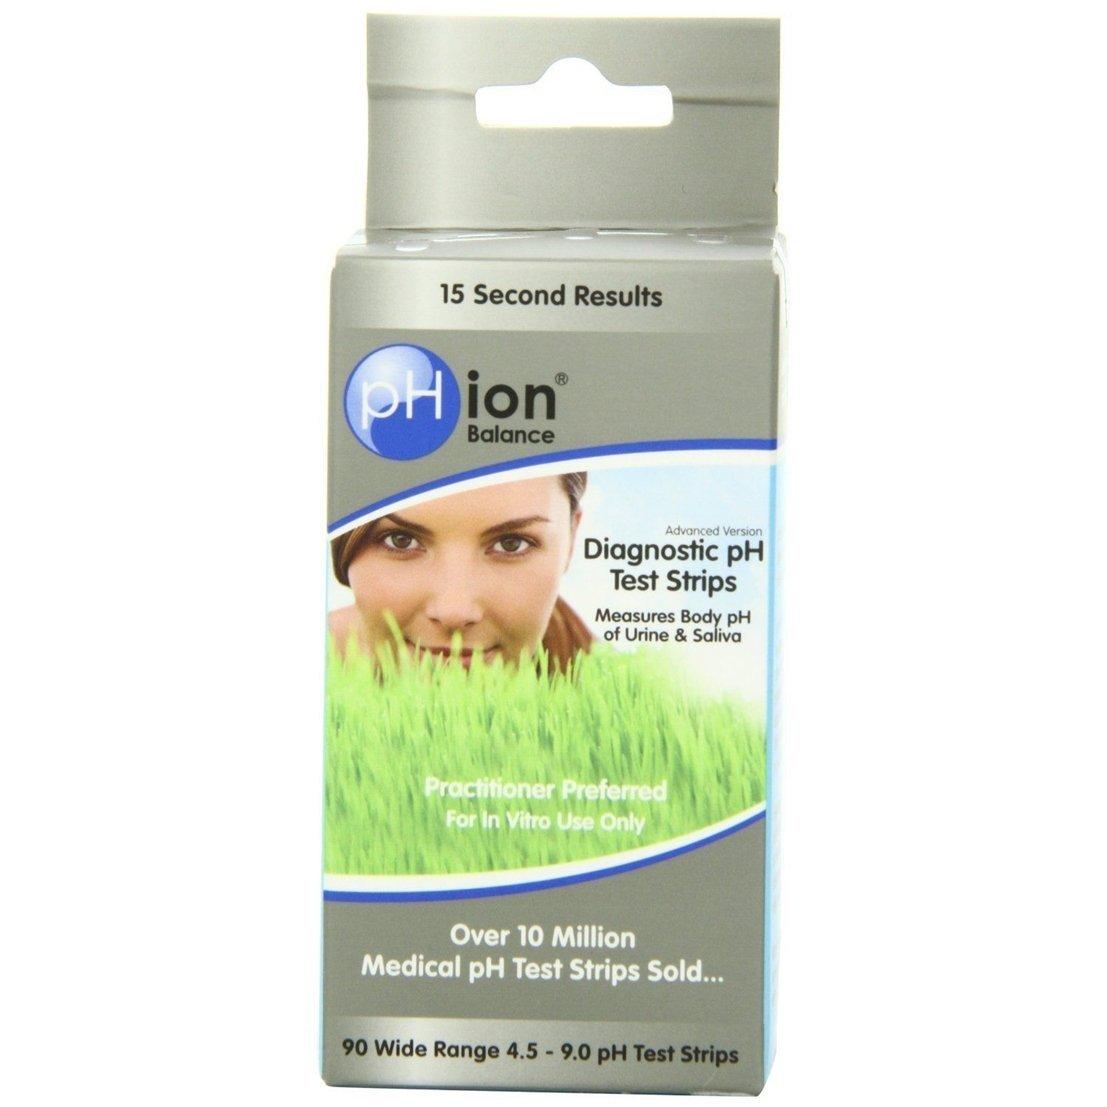 90-Count Ideal Popular pH Balance Test Strips Urine and Saliva Sensitive Check Diagnostic Kit 4.5-9.0 Wide Range